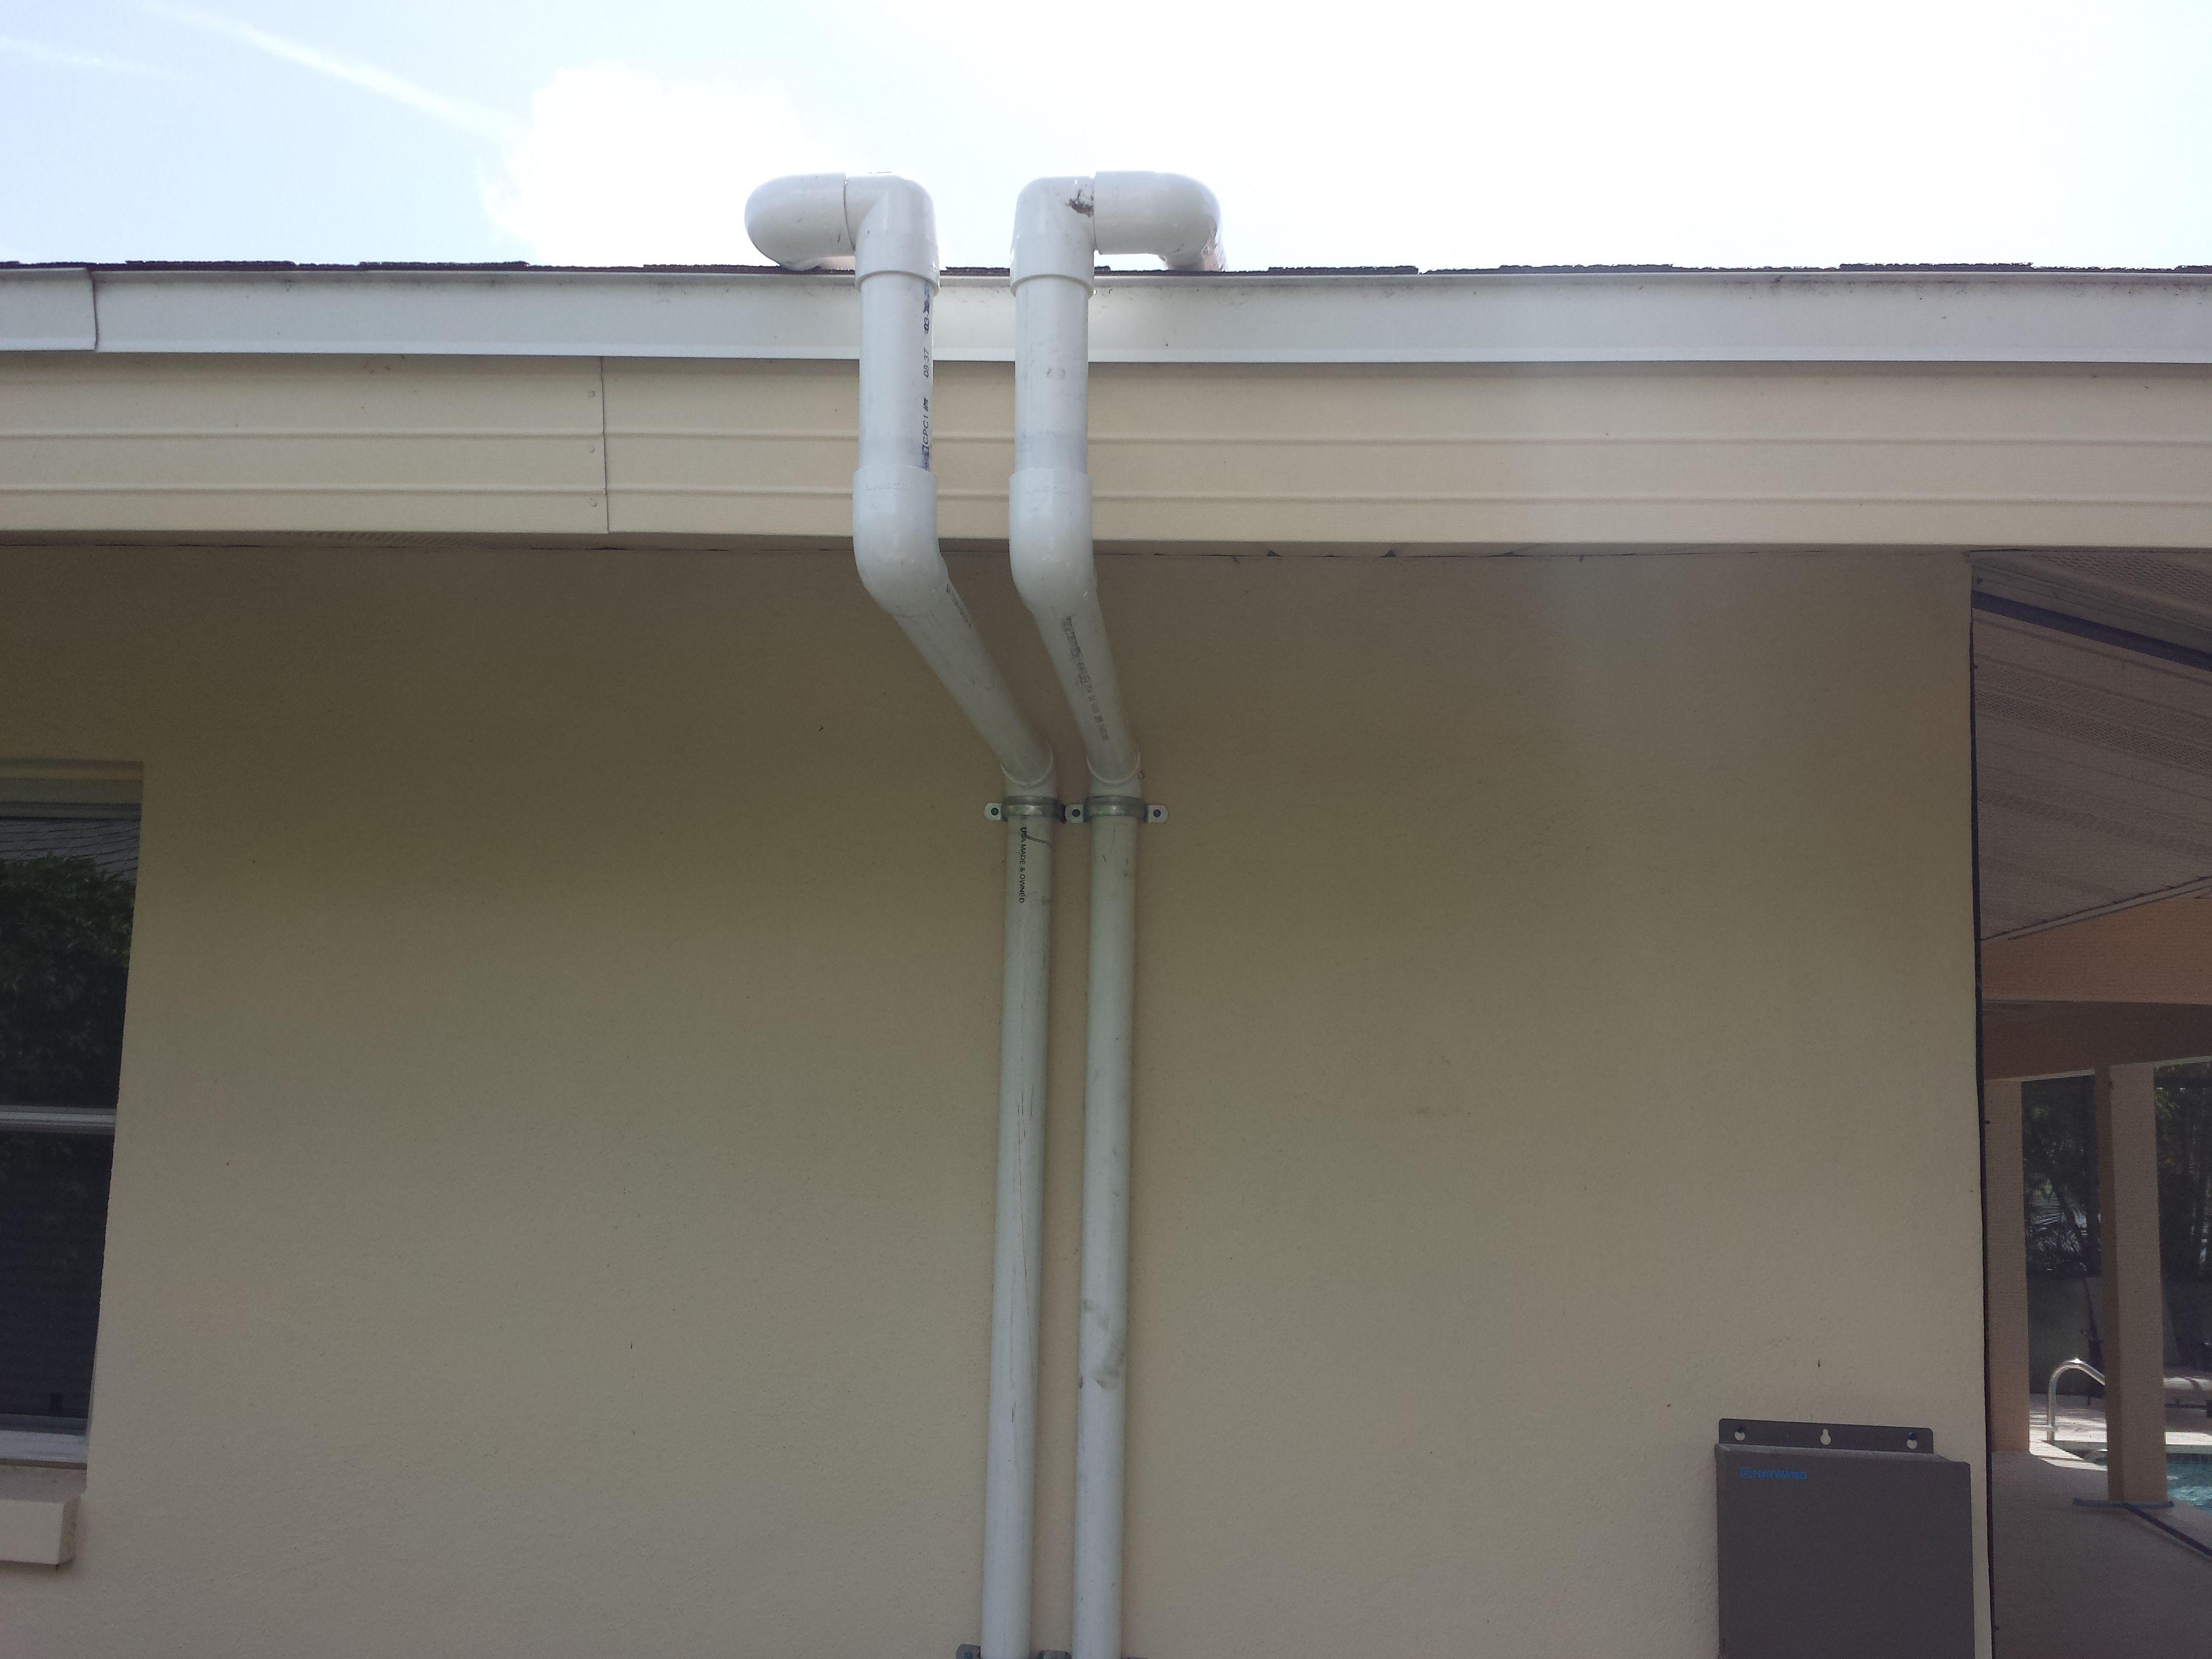 Vortex Solar Pool Heater Pvc Feed Return Solar Plumbing Www Diysolarpoolheaterkits Com Solar Pool Heater Pool Heater Pool Heaters